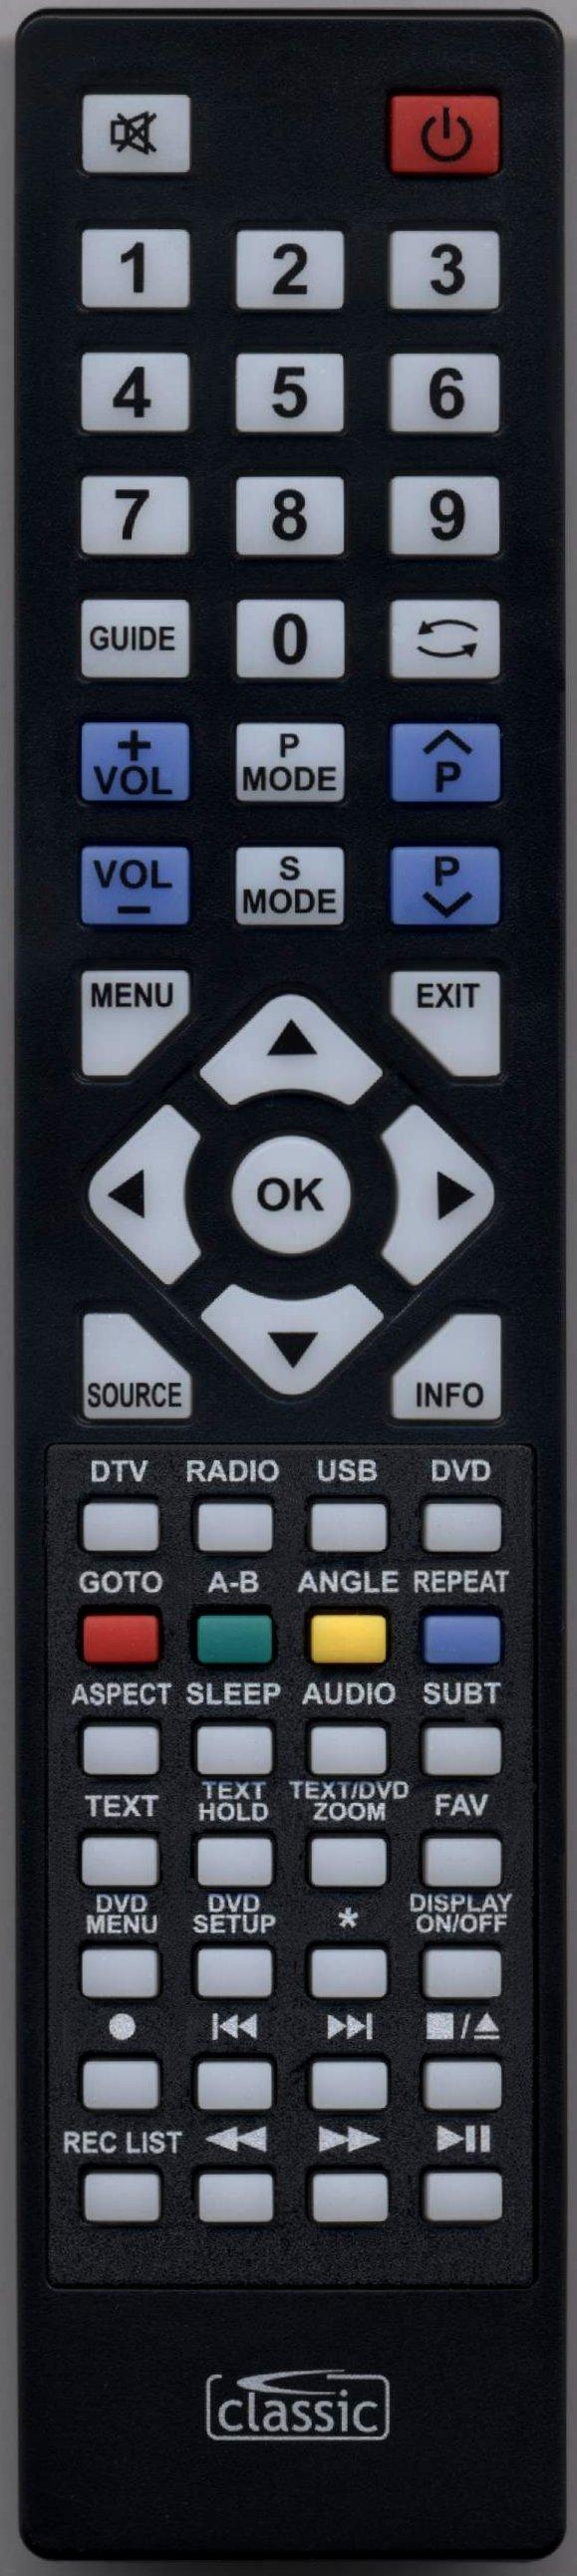 BLAUPUNKT 40/148I-GB-5B2-FHKUP-UK Remote Control Alternative